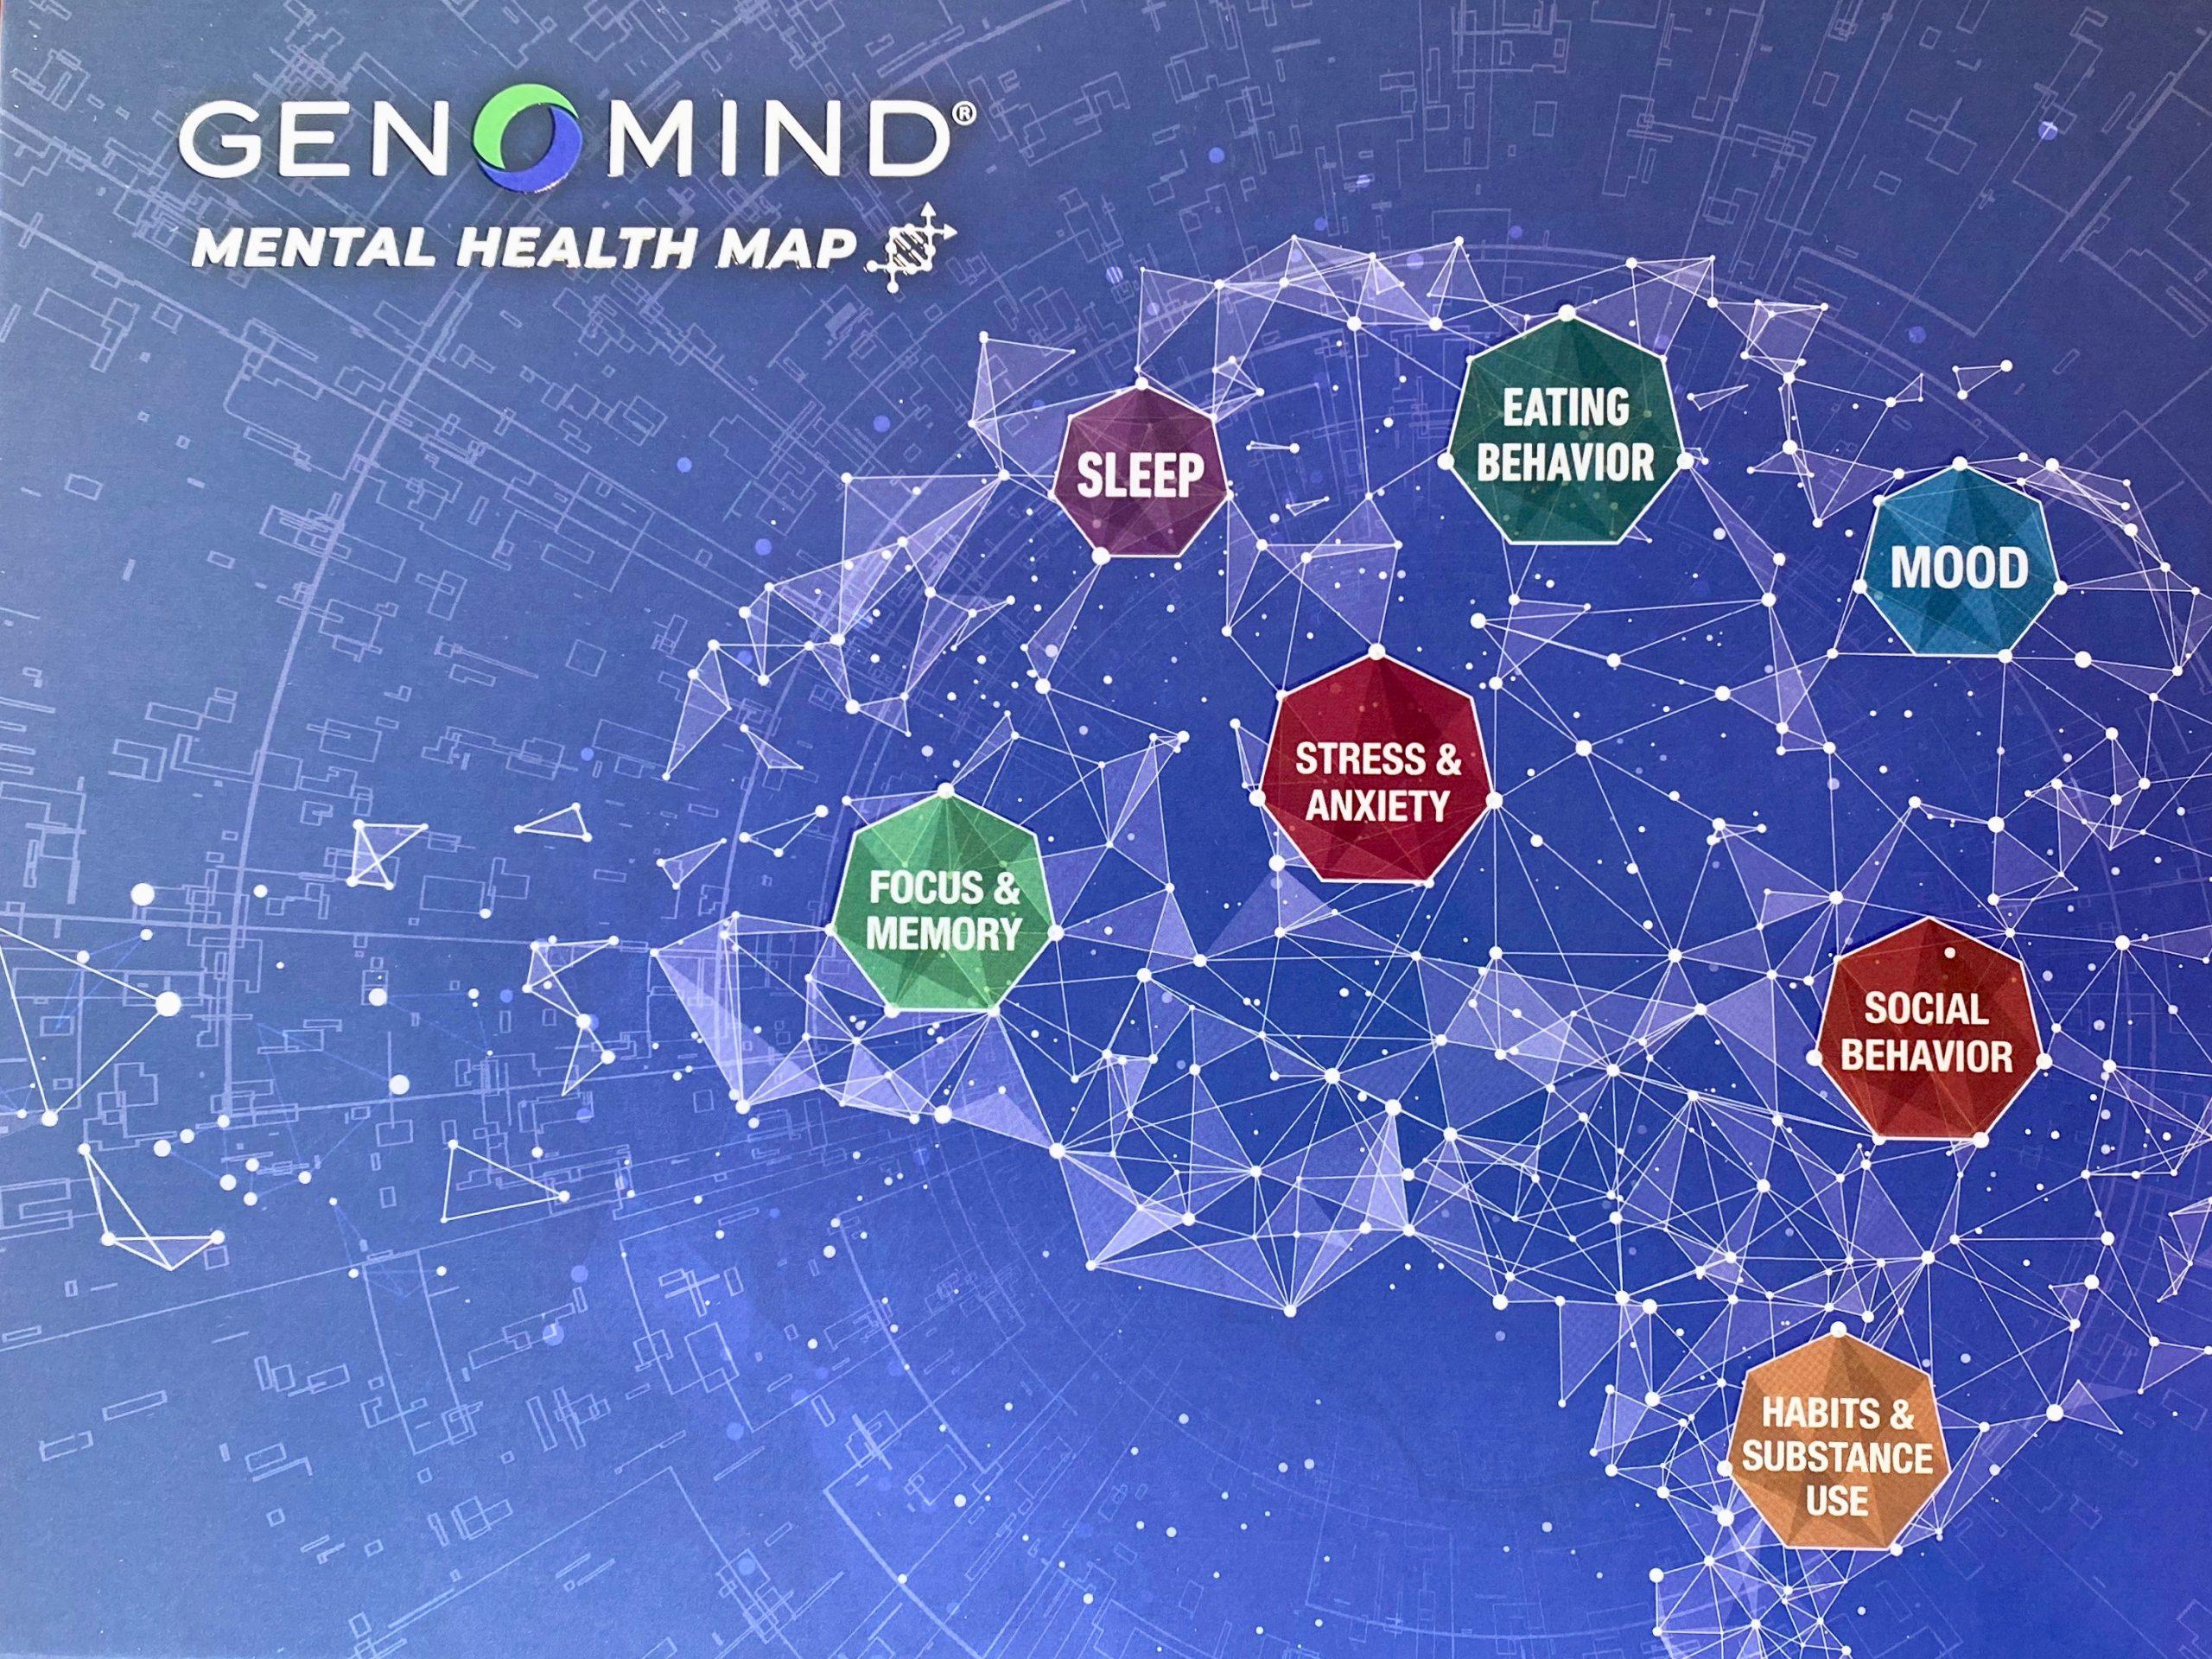 Genomind Mental Health Map kit cover